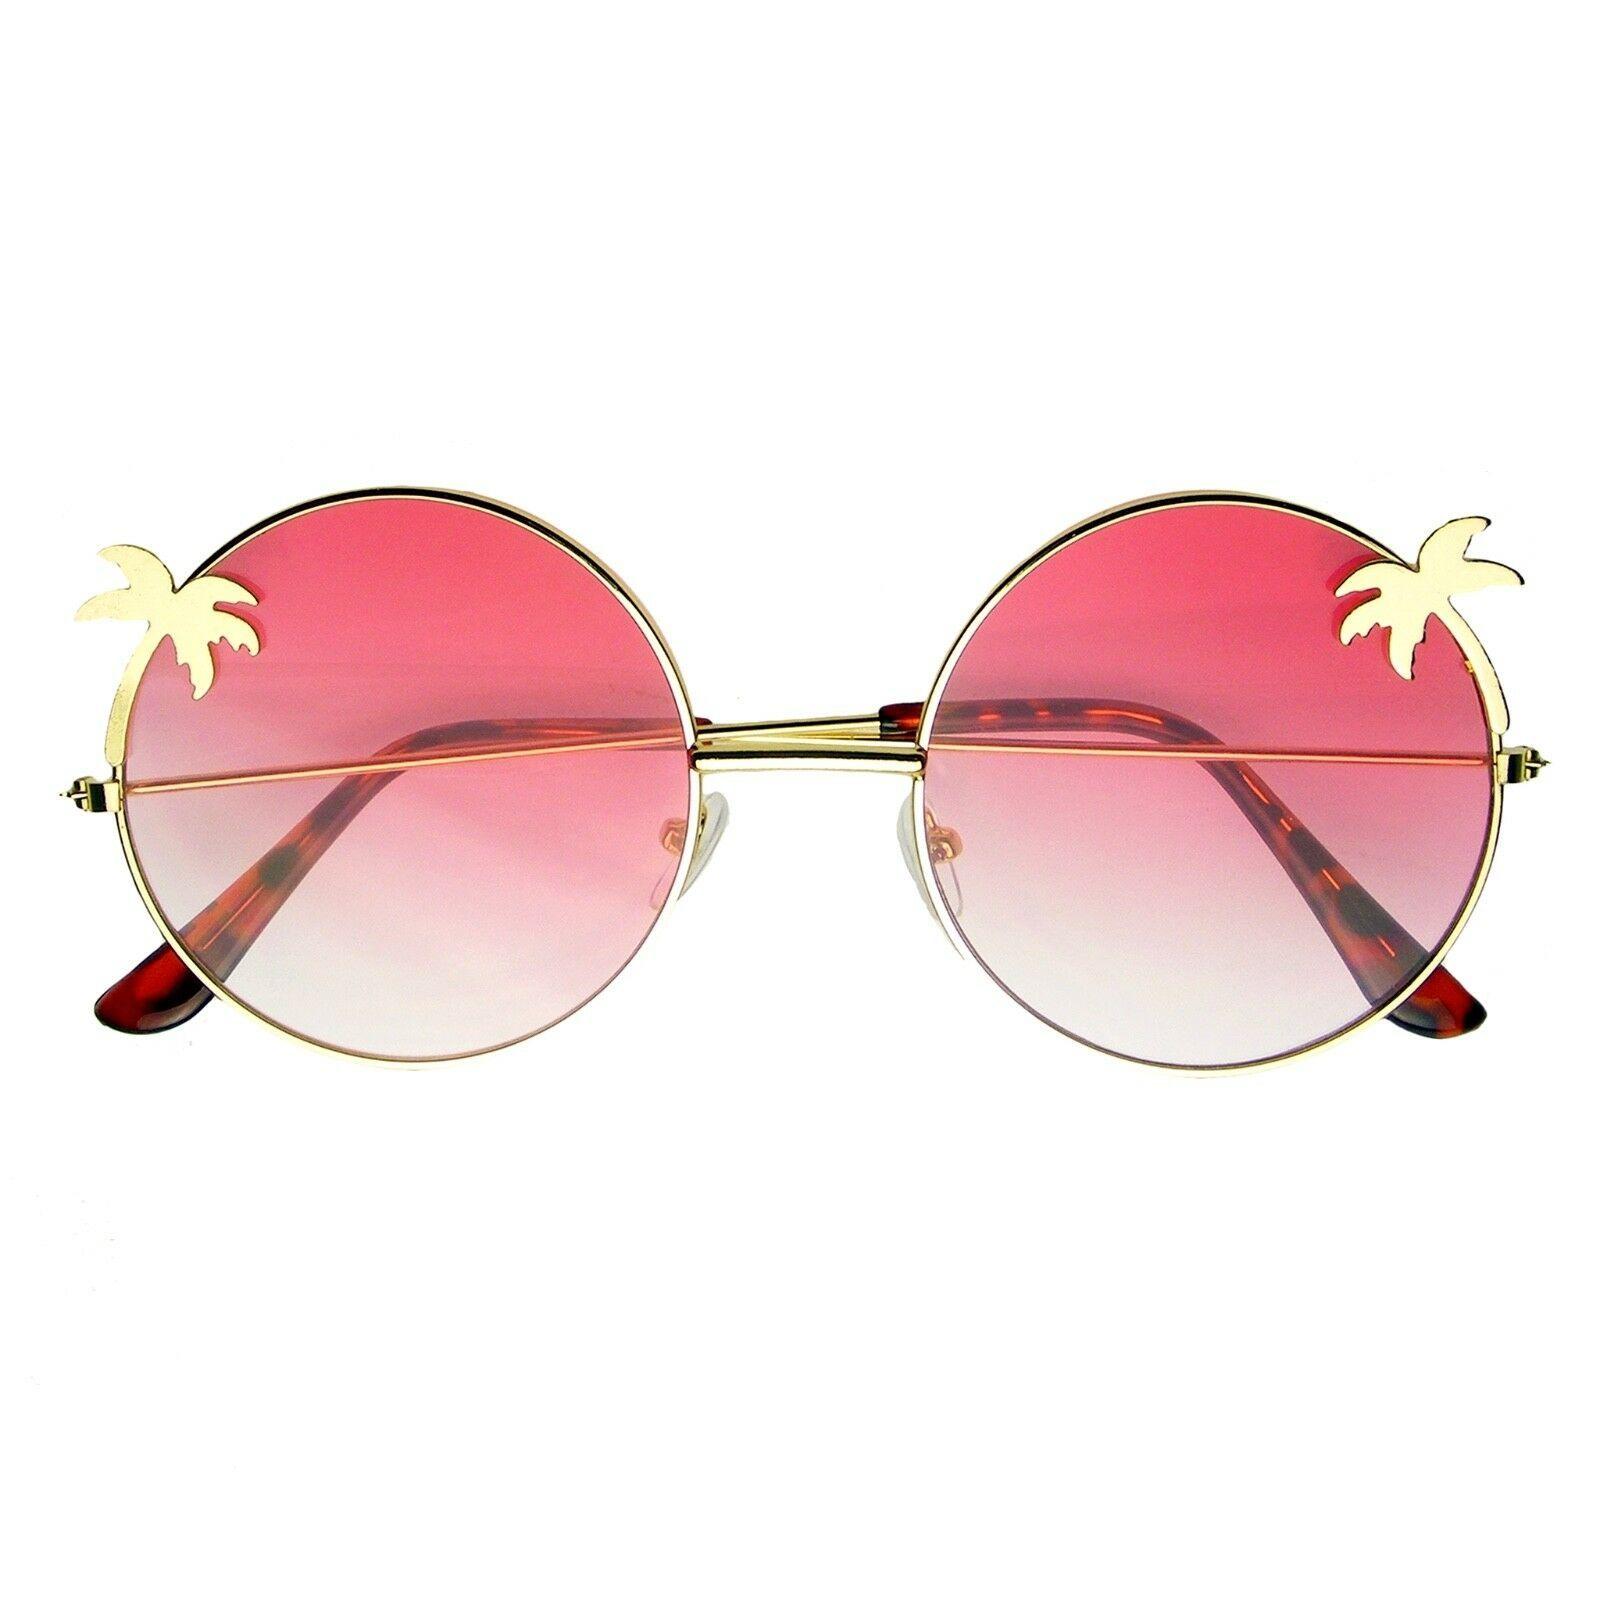 Vintage Retro Round Sun Glasses Hippie Boho Sunglasses image 3